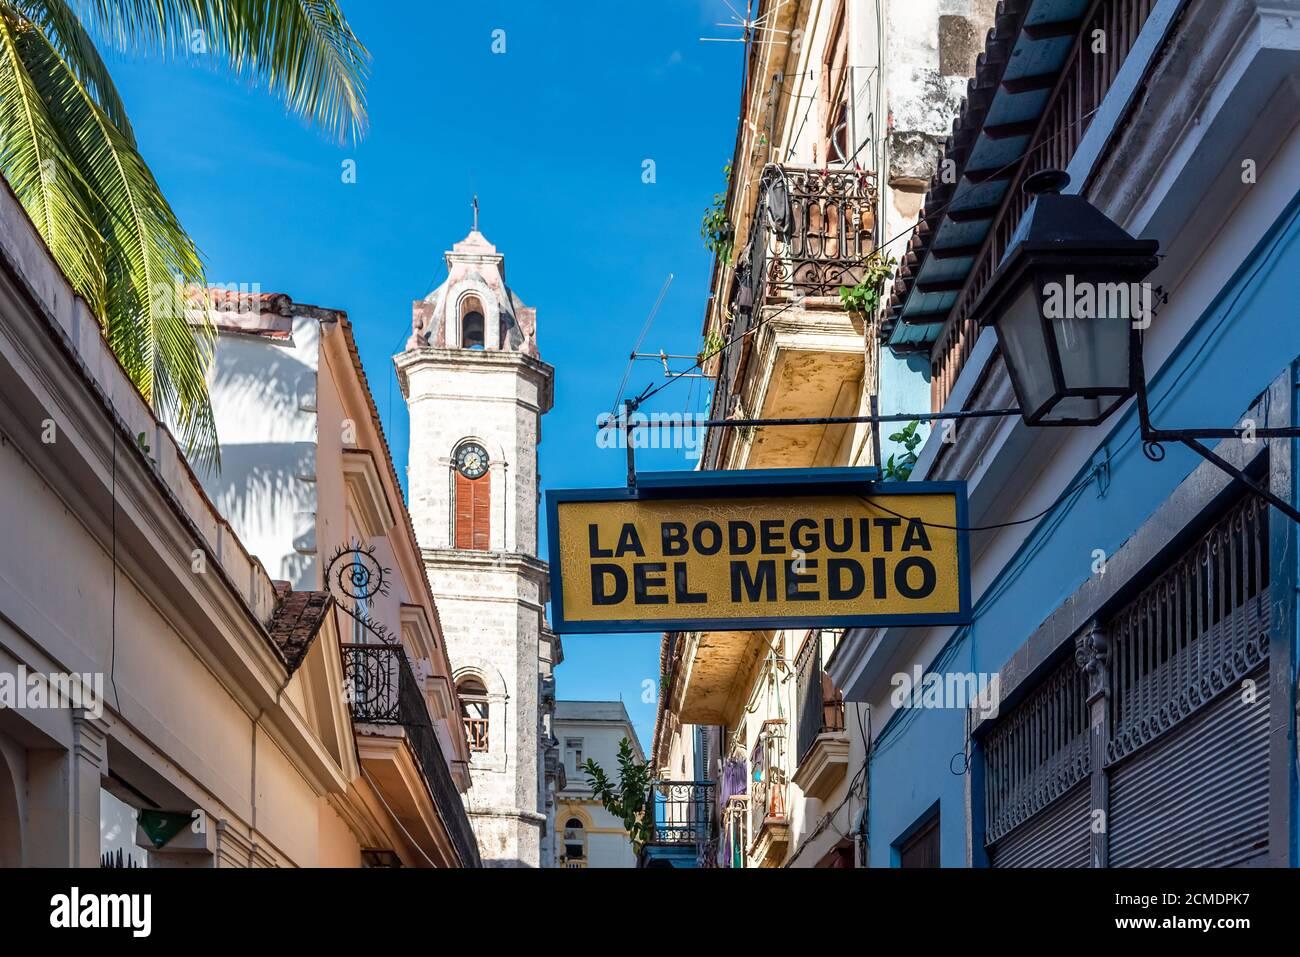 August 23, 2019: La Bodeguita del Medio sign. Old Havana, Cuba Stock Photo